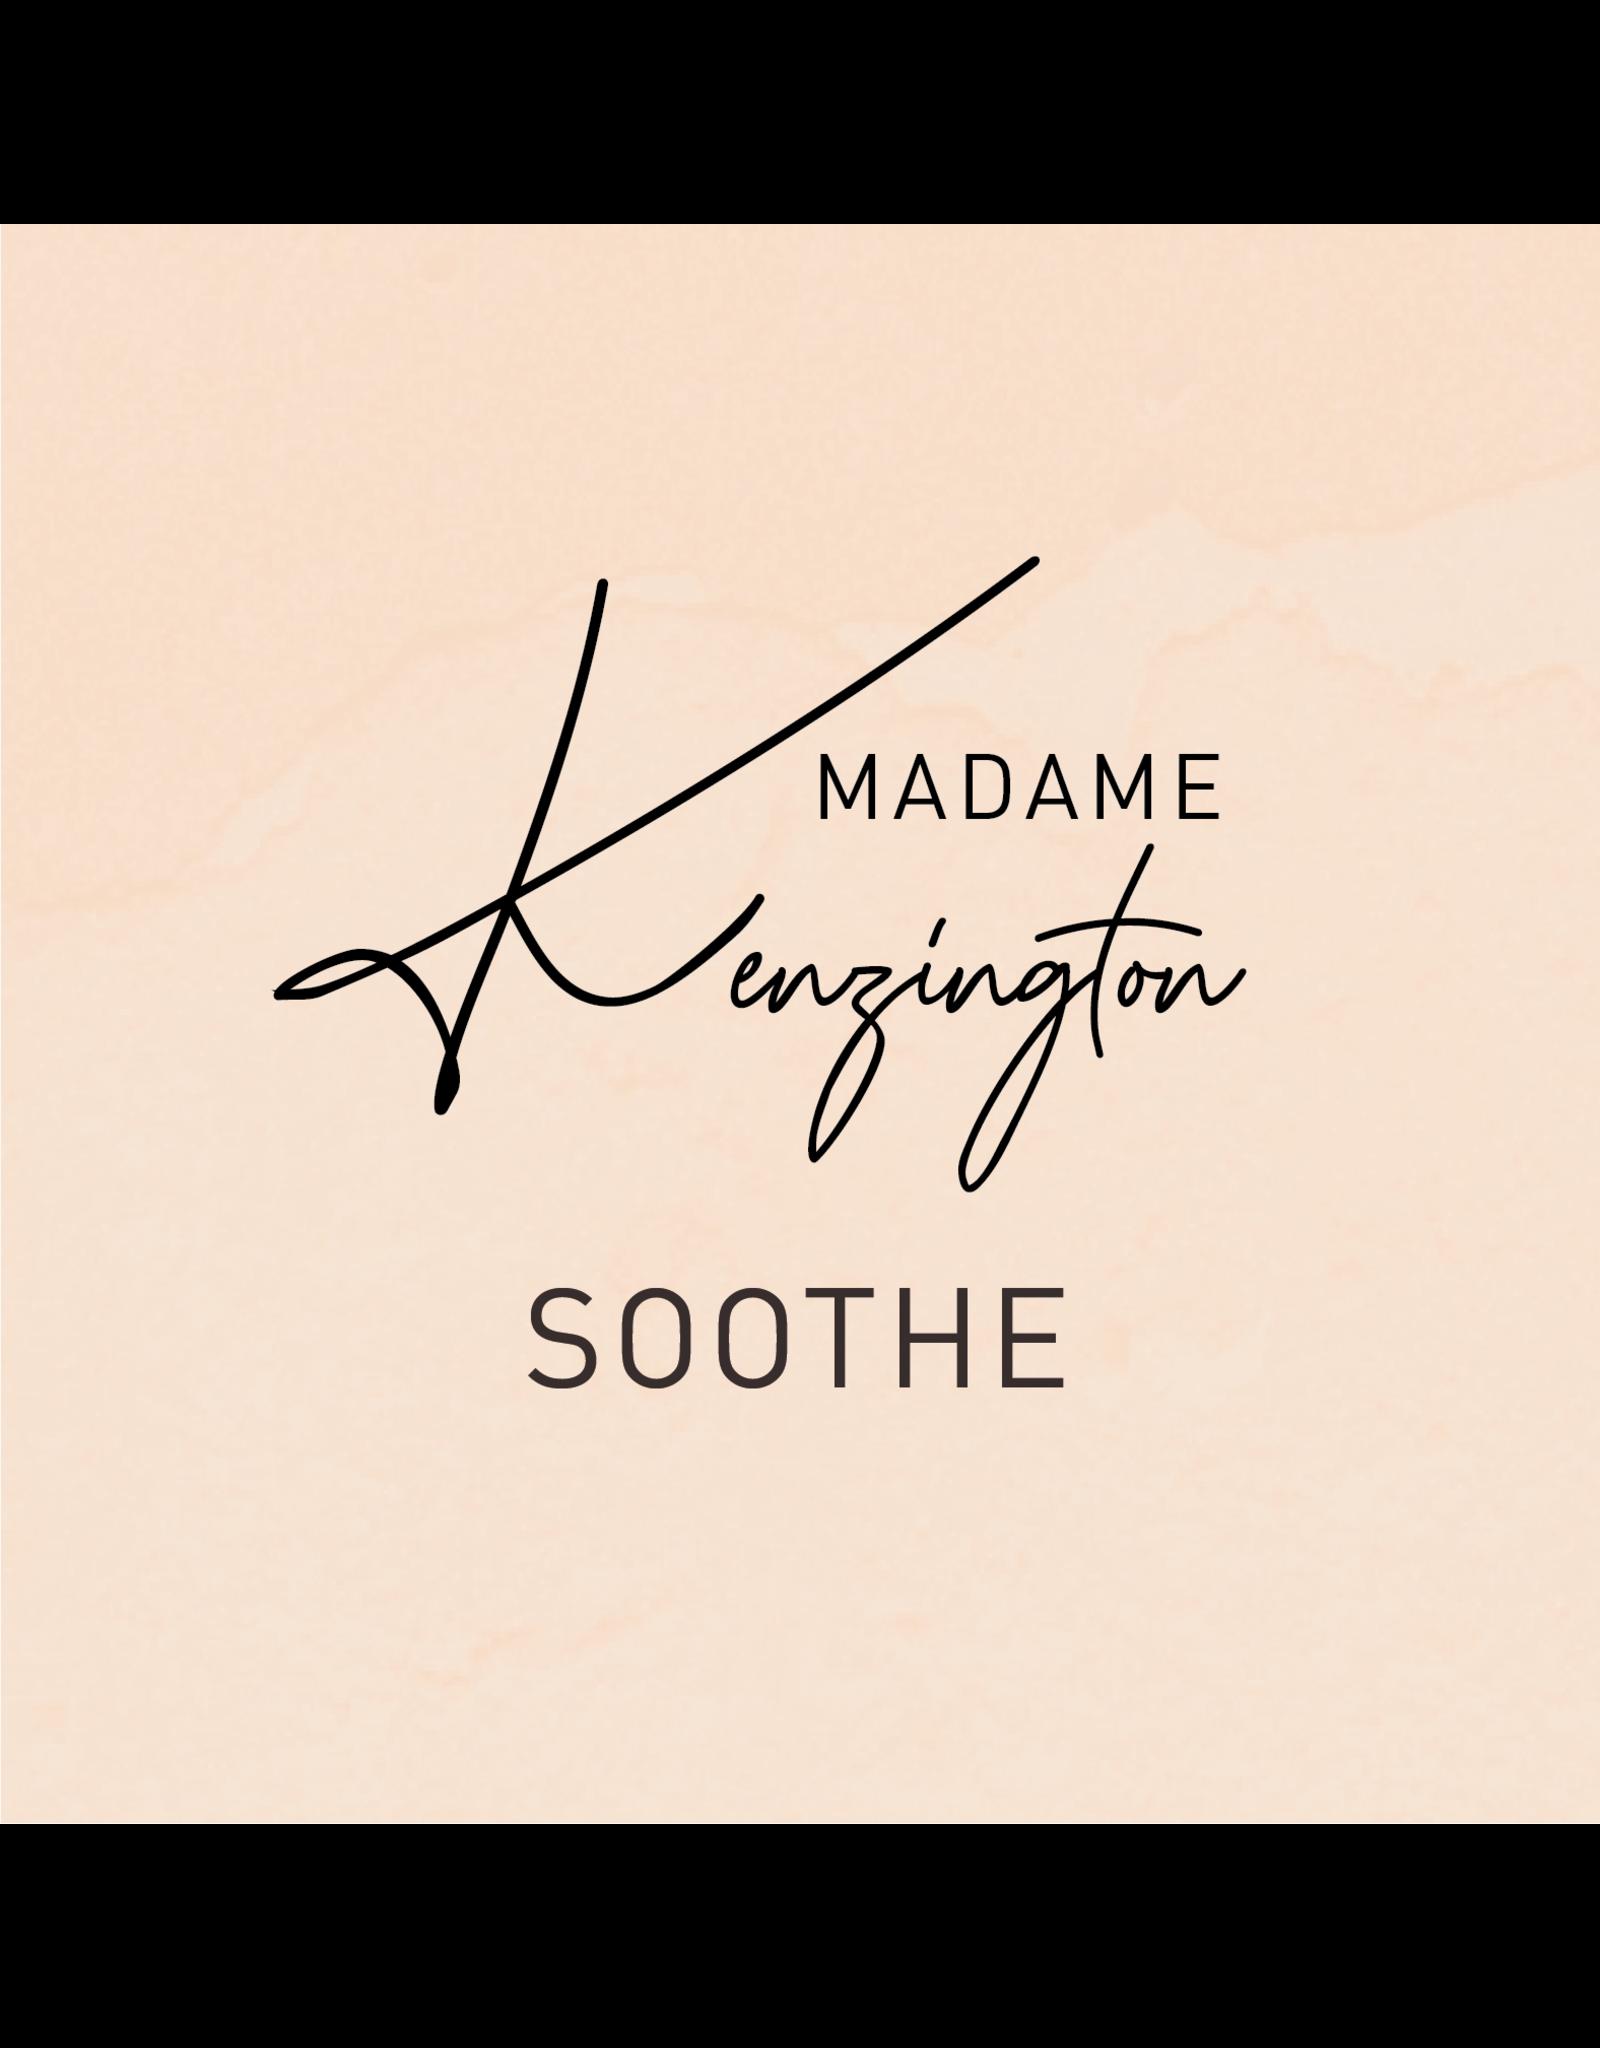 Madame Kenzington Madame Kenzington SOOTHE